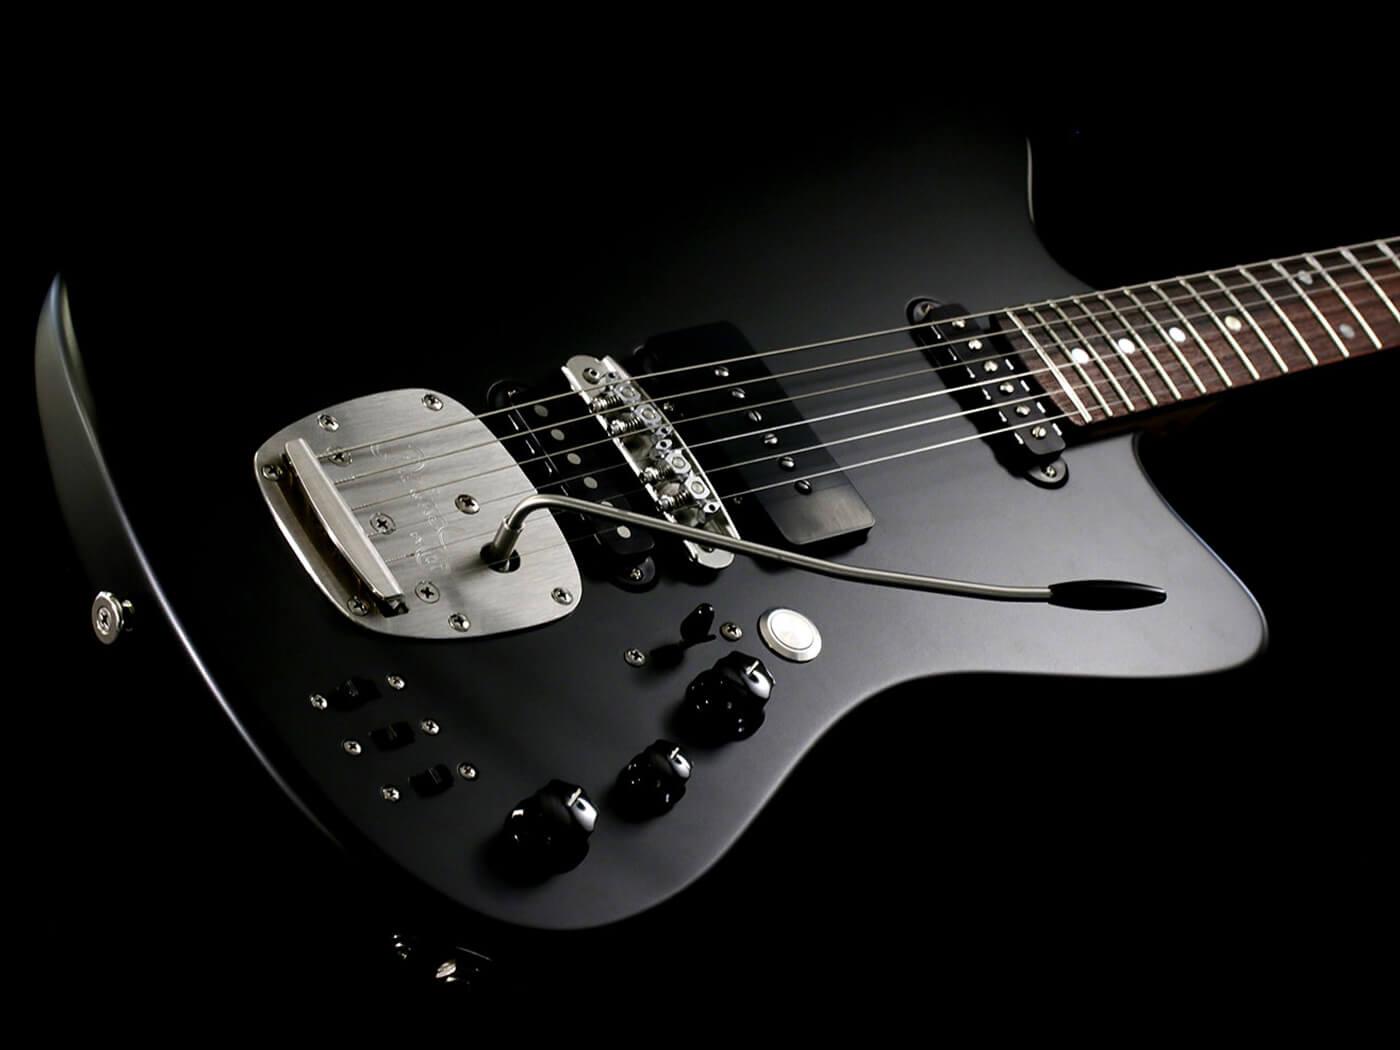 Deimel Guitarworks The Experimental Guitar